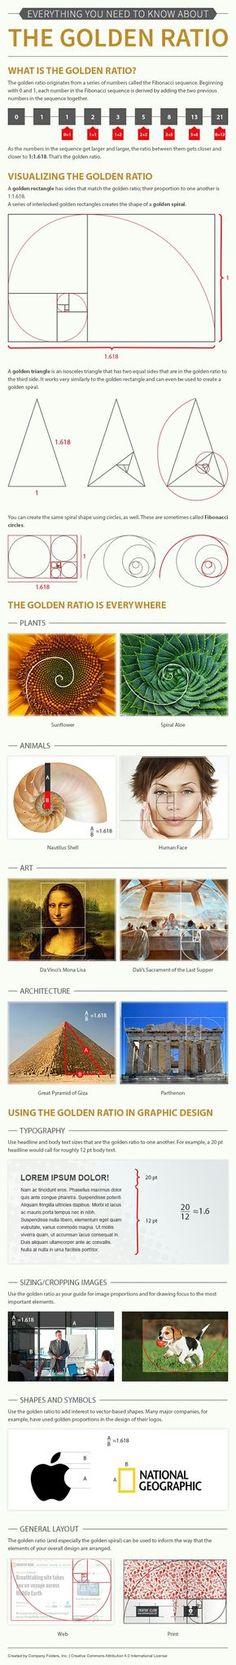 The golden ratio for design.